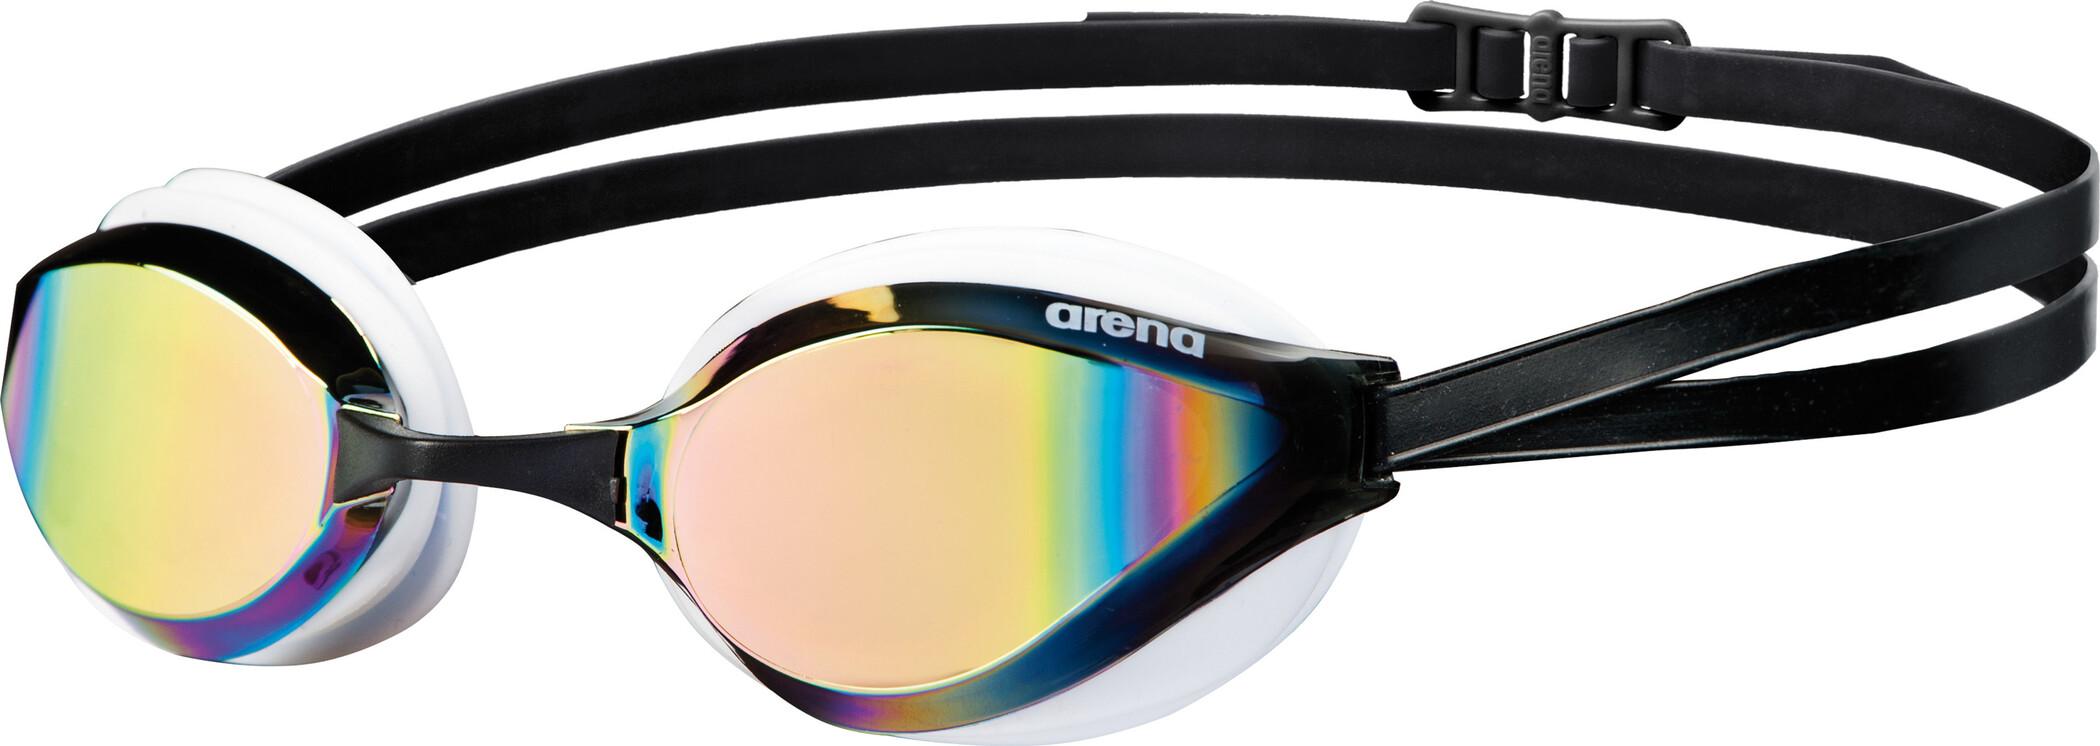 arena Python Mirror Svømmebriller, revo-white | Svømmetøj og udstyr